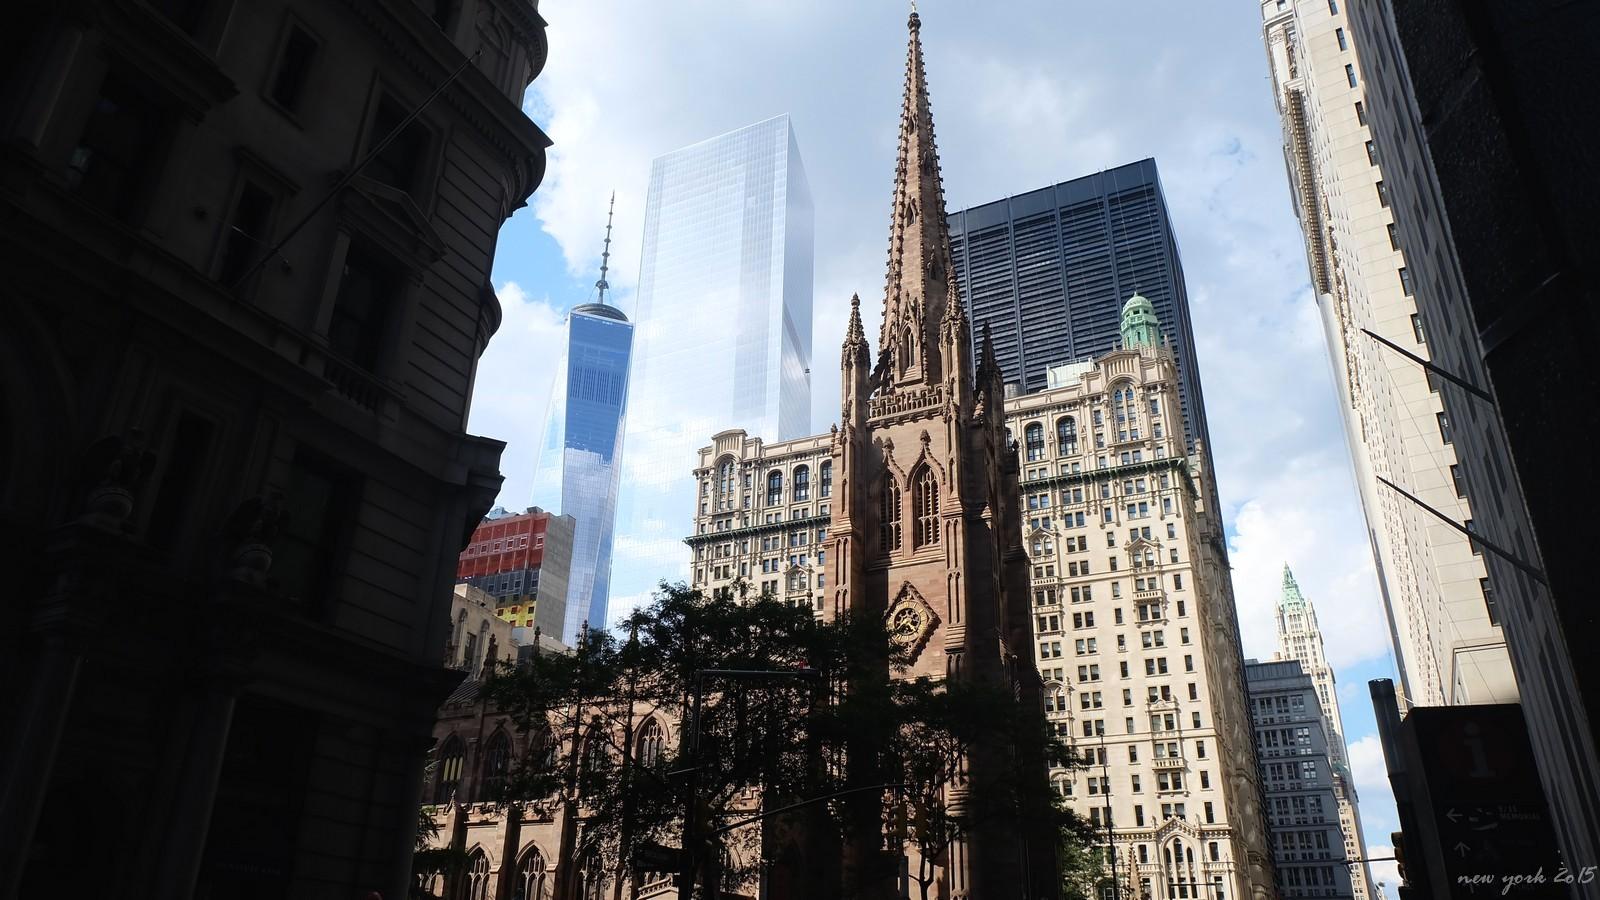 Trinity Church, Broadway, New York City, USA